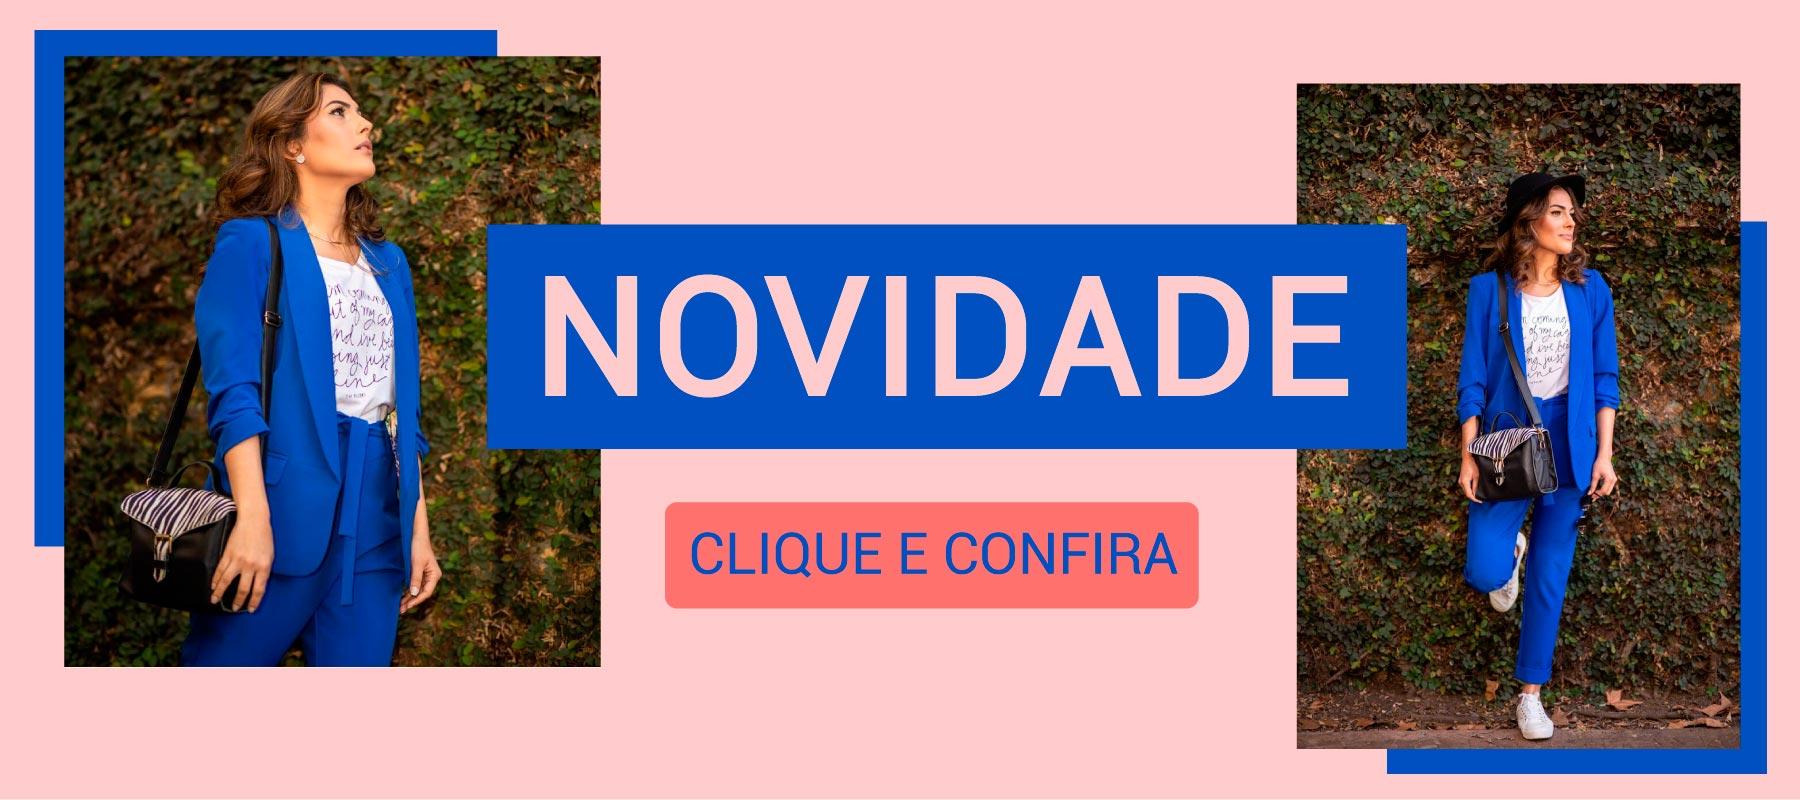 novidade-blazer-feminino-alfaiataria-alongado-azul-bic